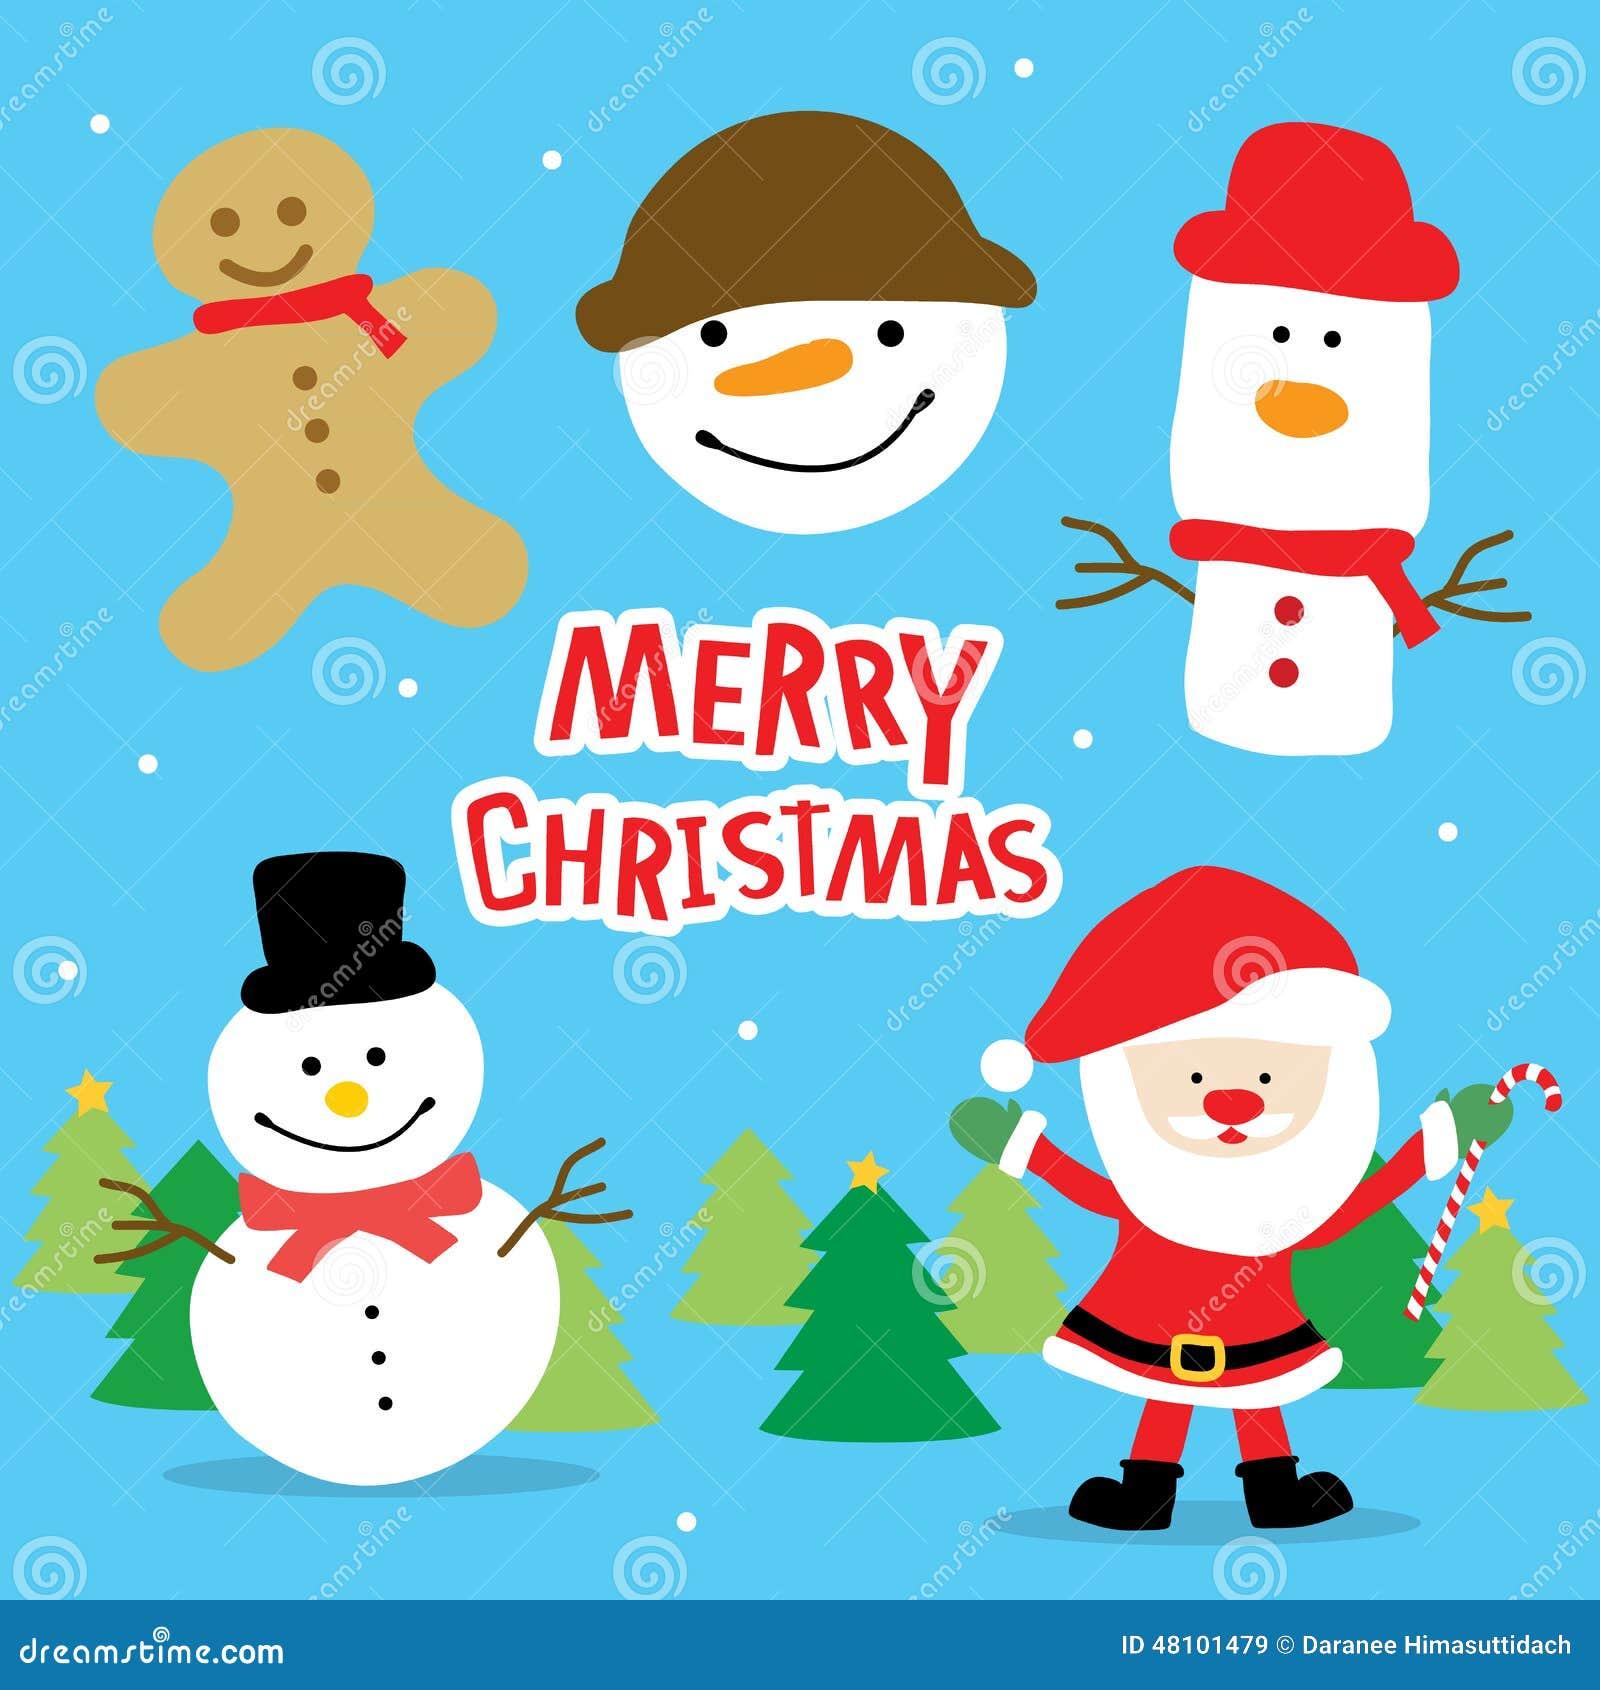 Girl Love Merry Christmas Cute Cartoon Vector Stock Vector ...